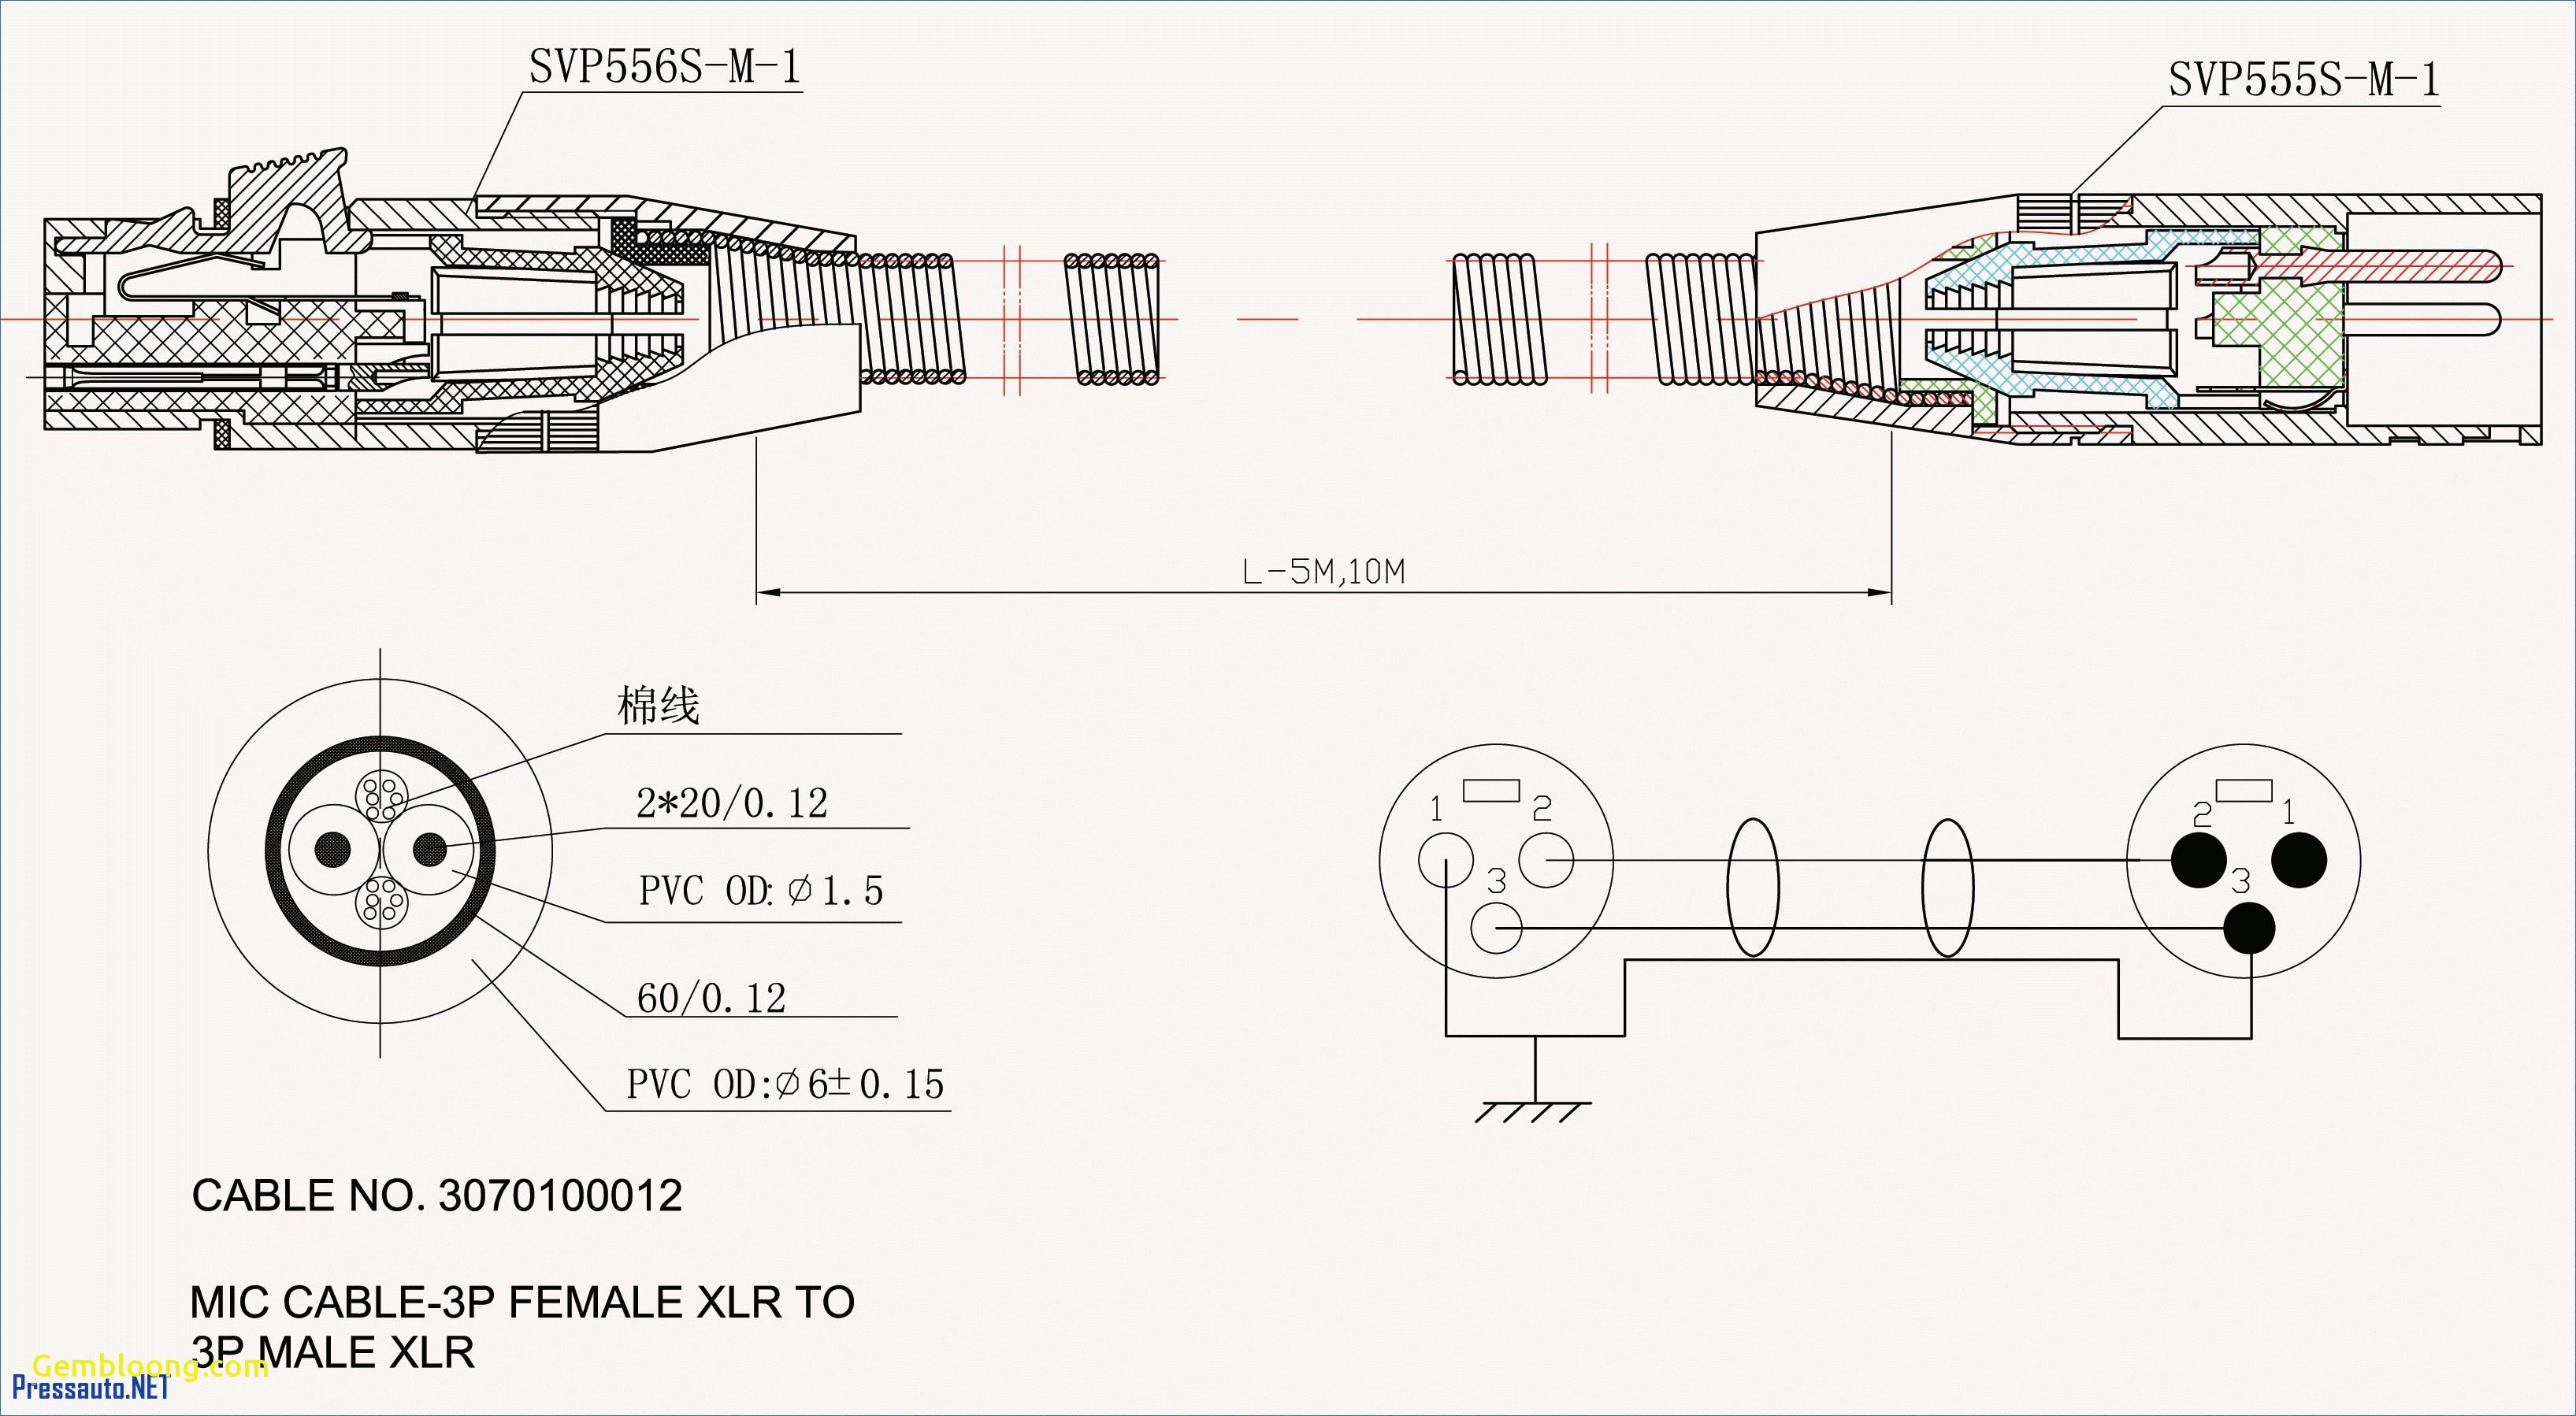 Water Cooled Engine Diagram ford Aerostar Engine Diagram 2000 ford Ranger 3 0 Heater Hose Of Water Cooled Engine Diagram